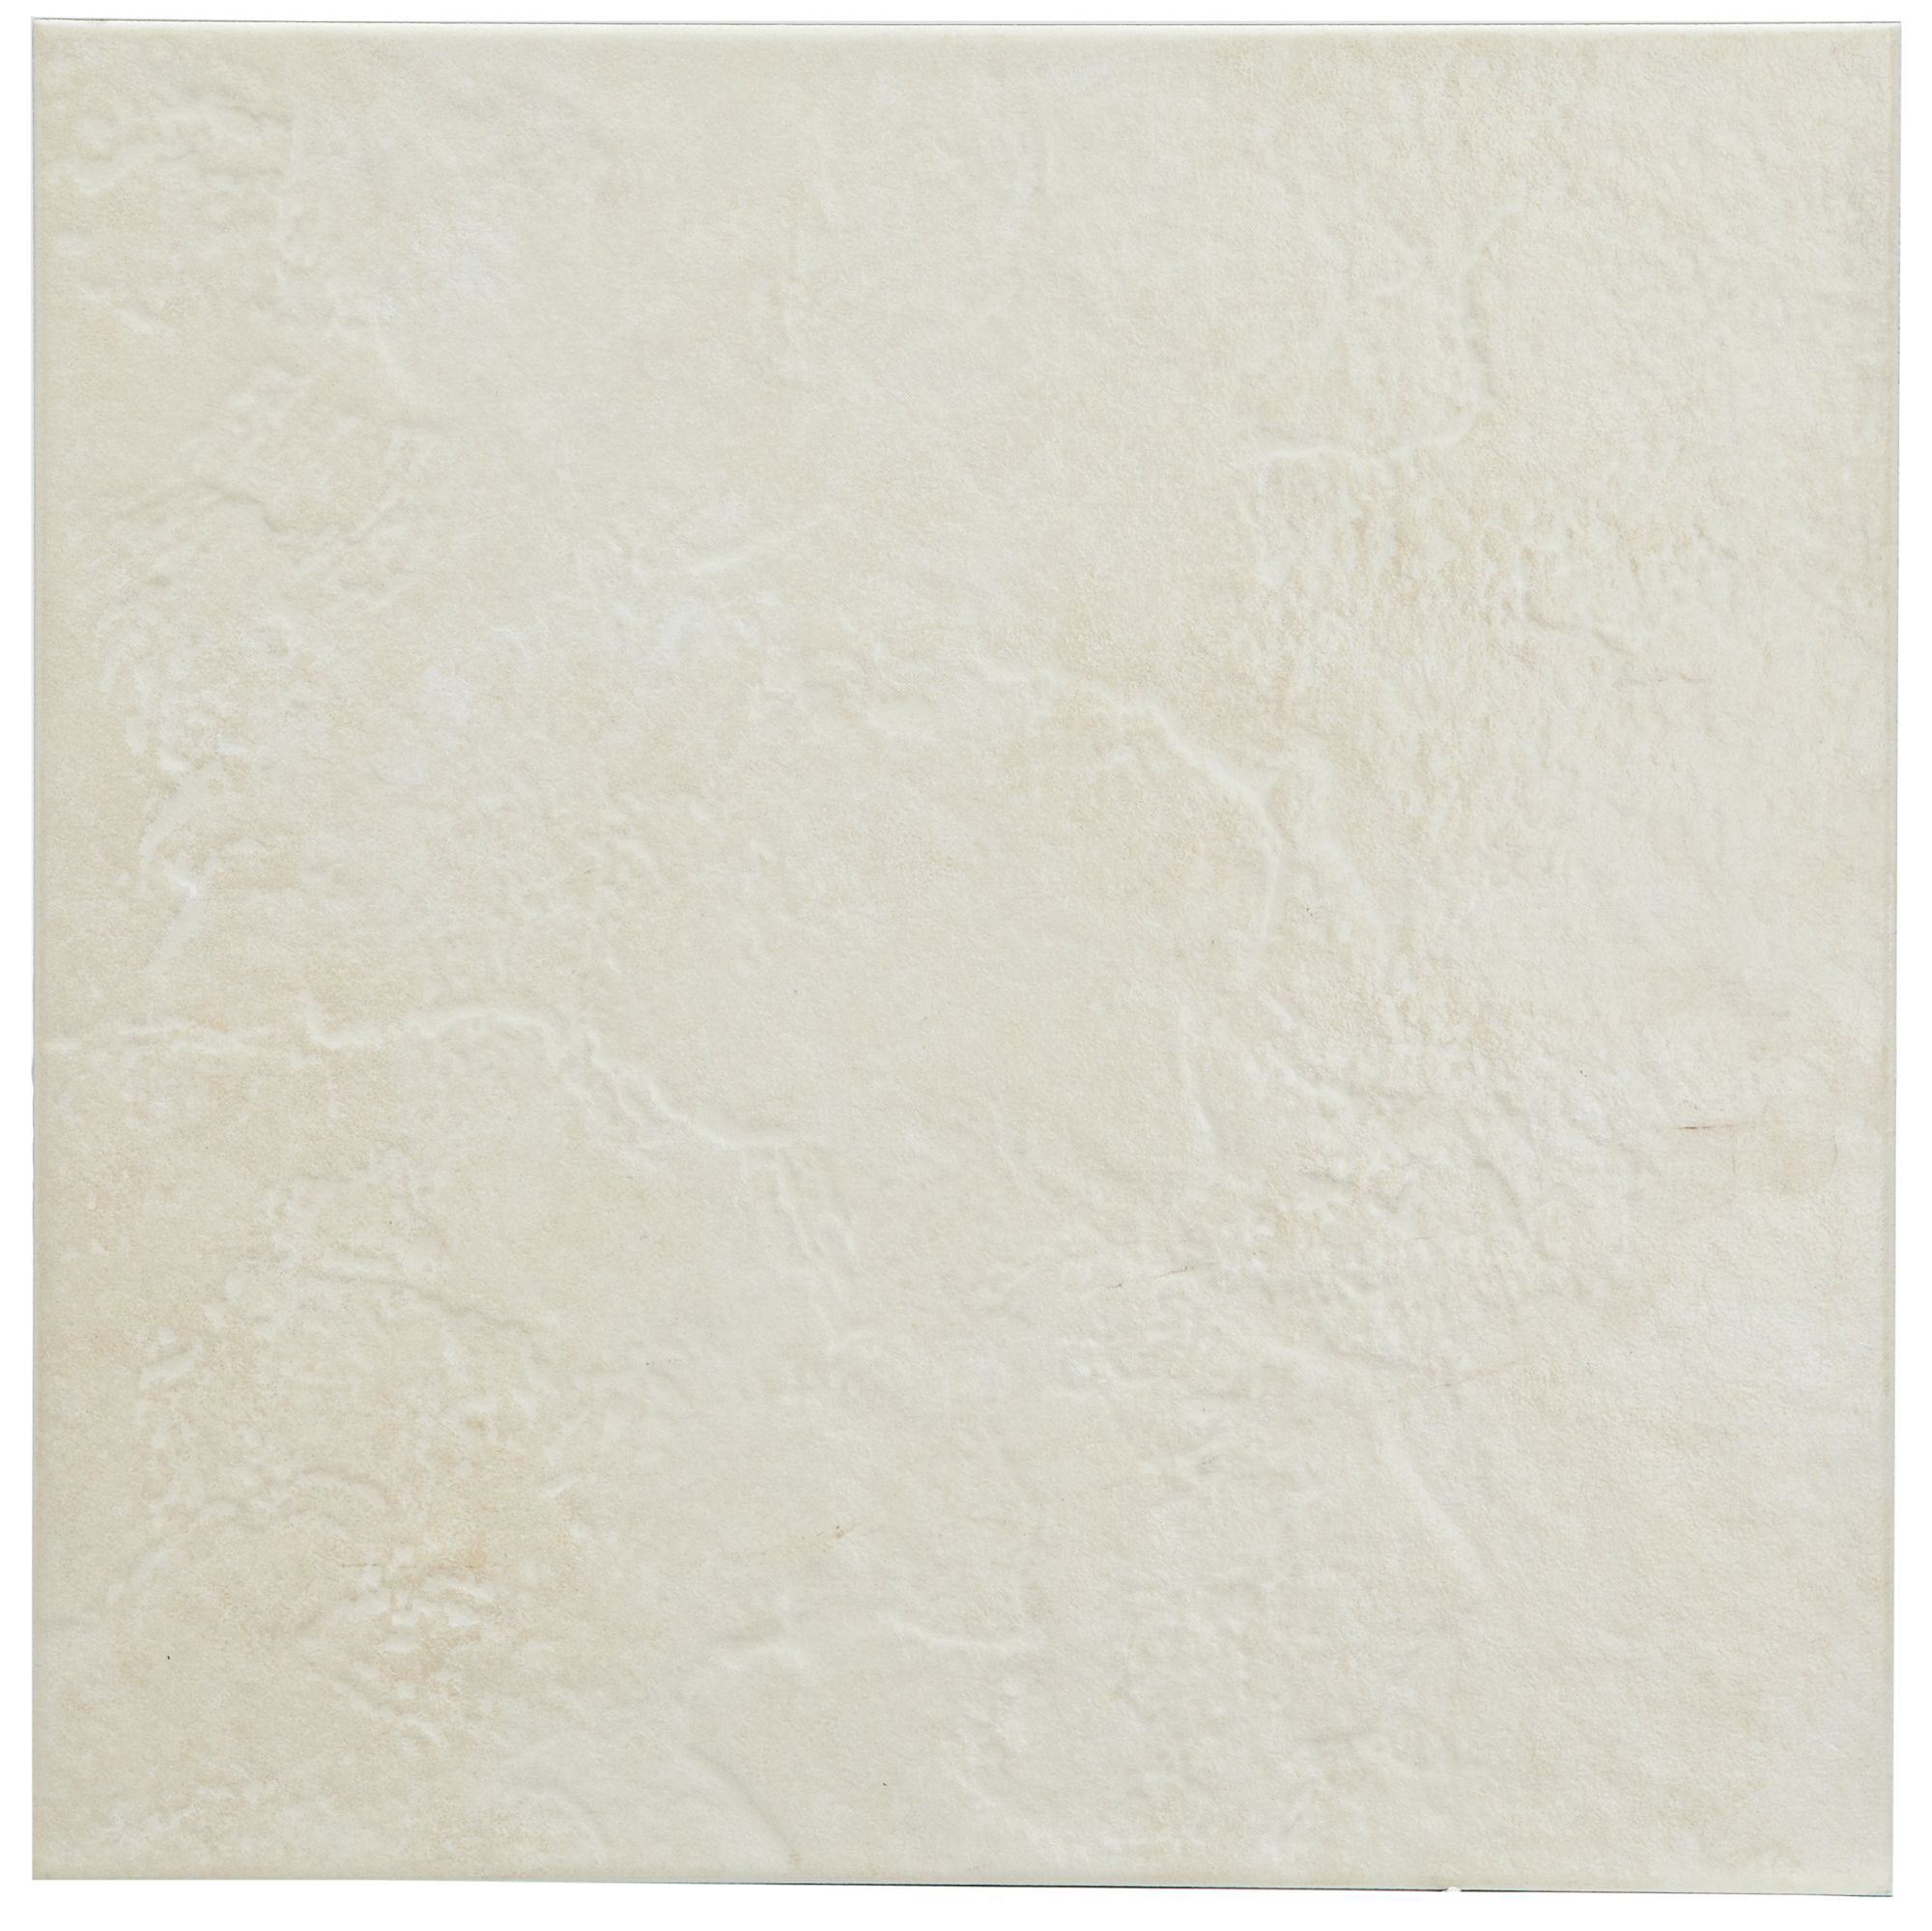 Cirque Beige Ceramic Floor Tile Pack Of 9 L 333mm W